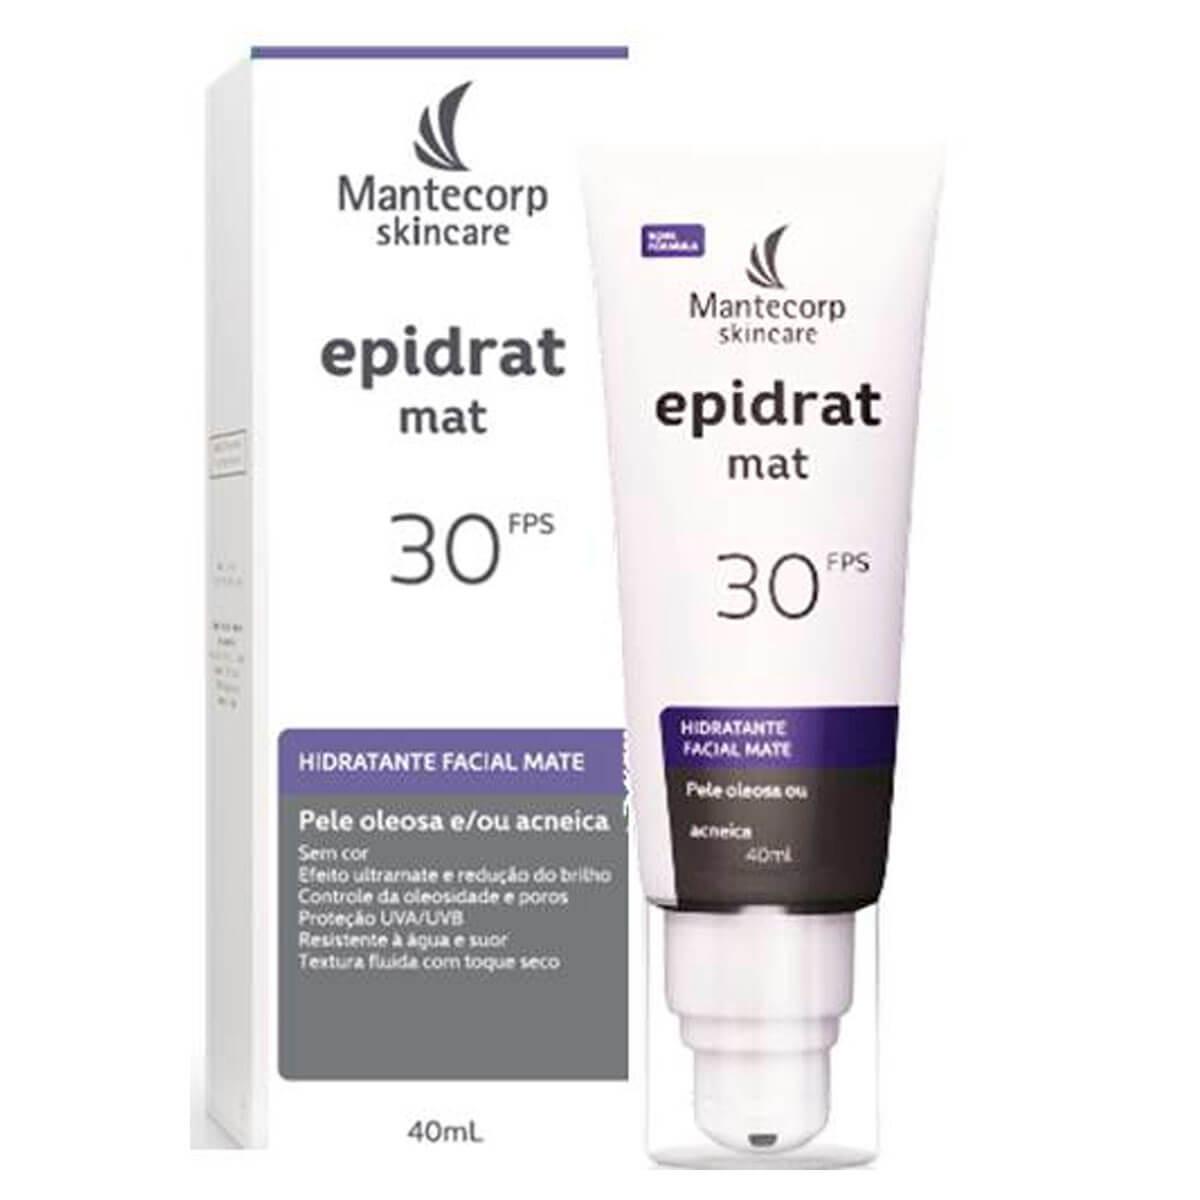 Hidratante Facial Mate Epidrat Mat Mantecorp Sem Cor FPS 30 com 40ml 40ml